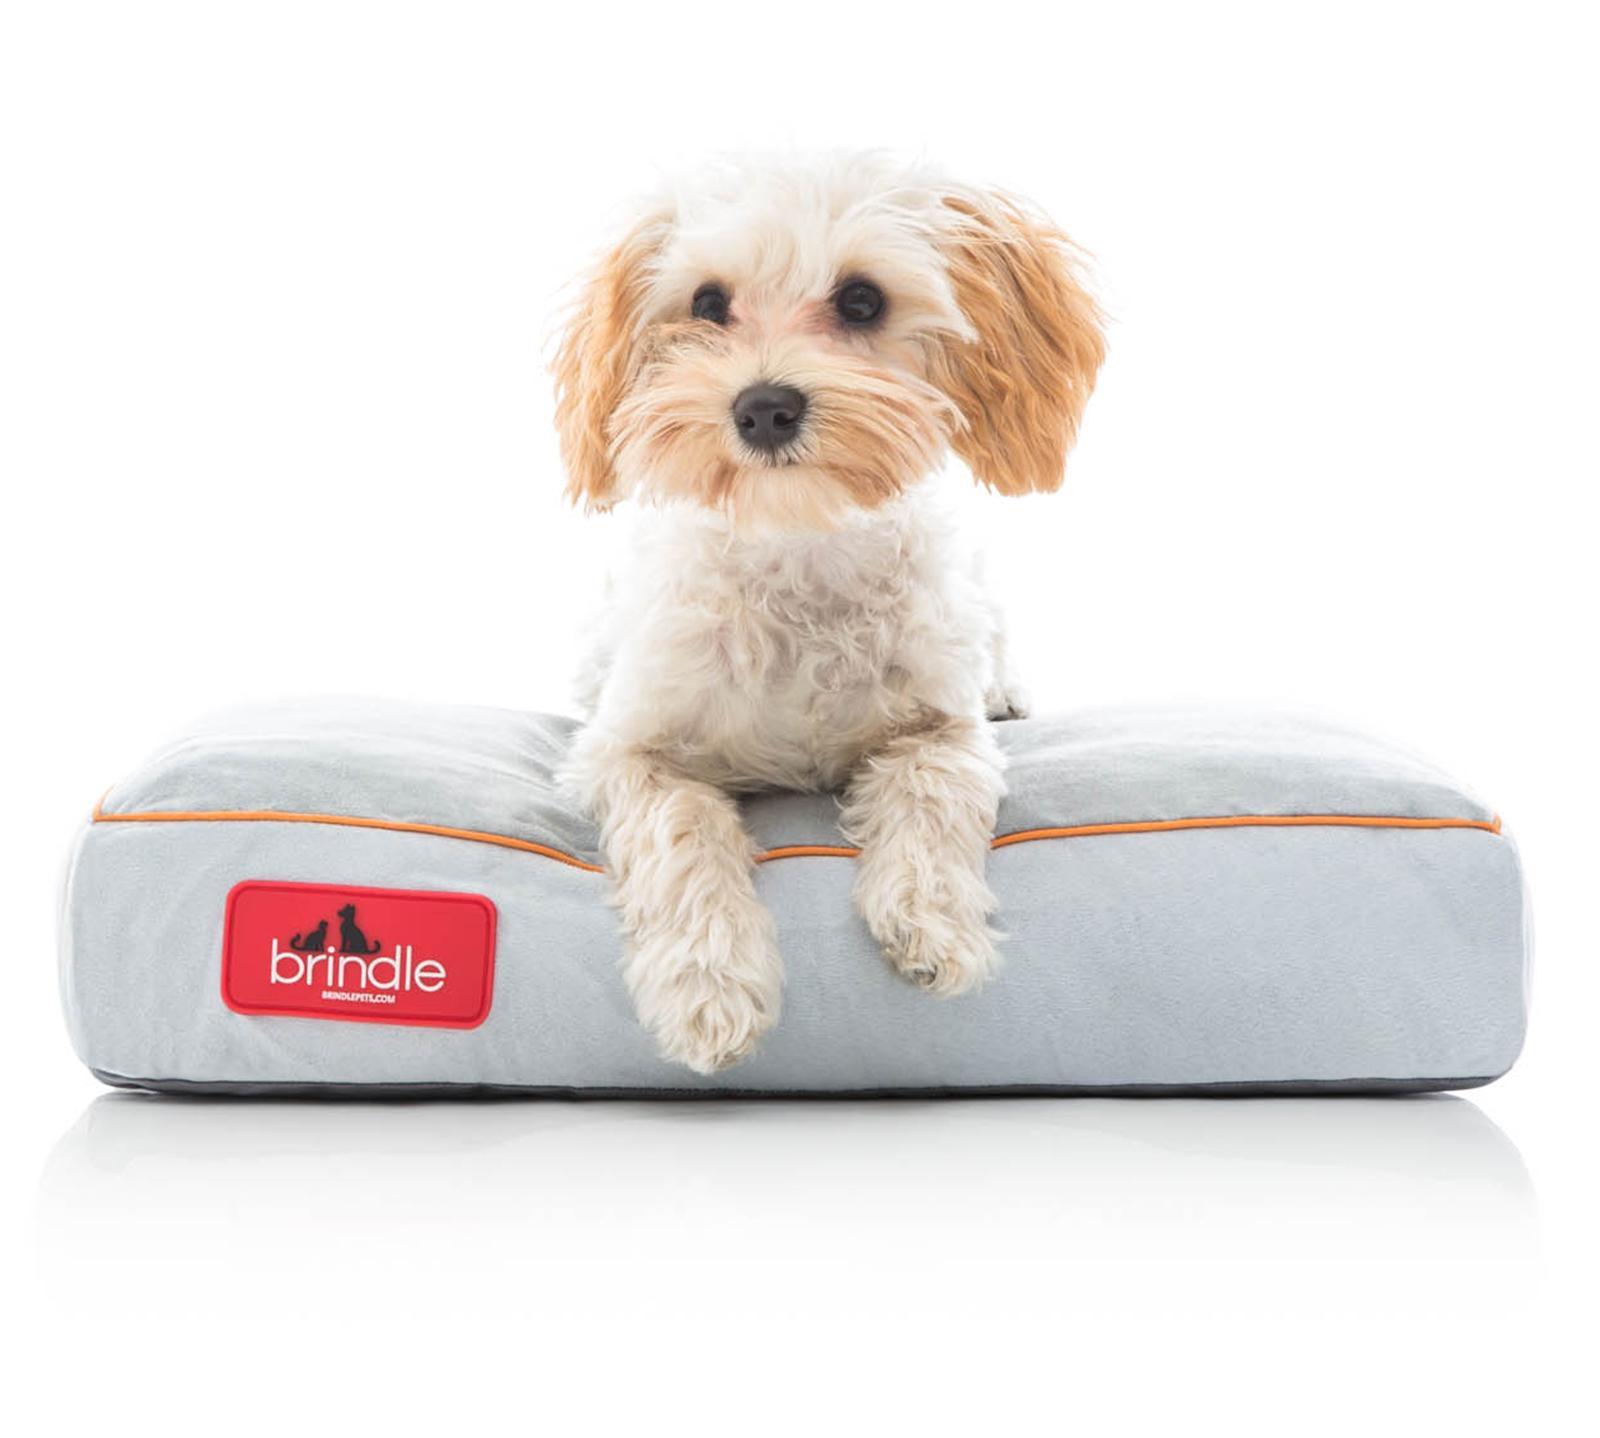 Dog in Brindle Plush Shredded Memory Foam Pet Bed